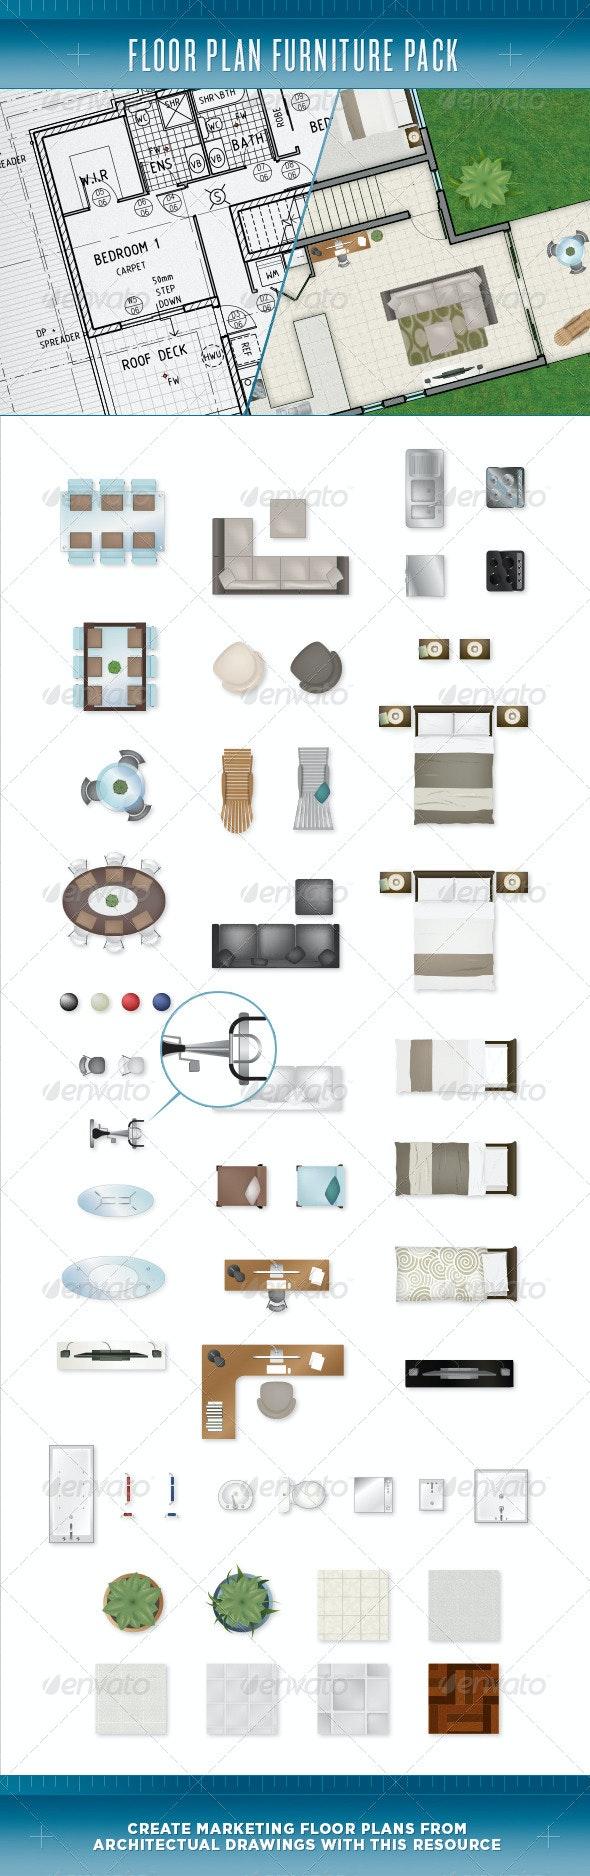 Floor Plan Furniture Pack - Objects Vectors